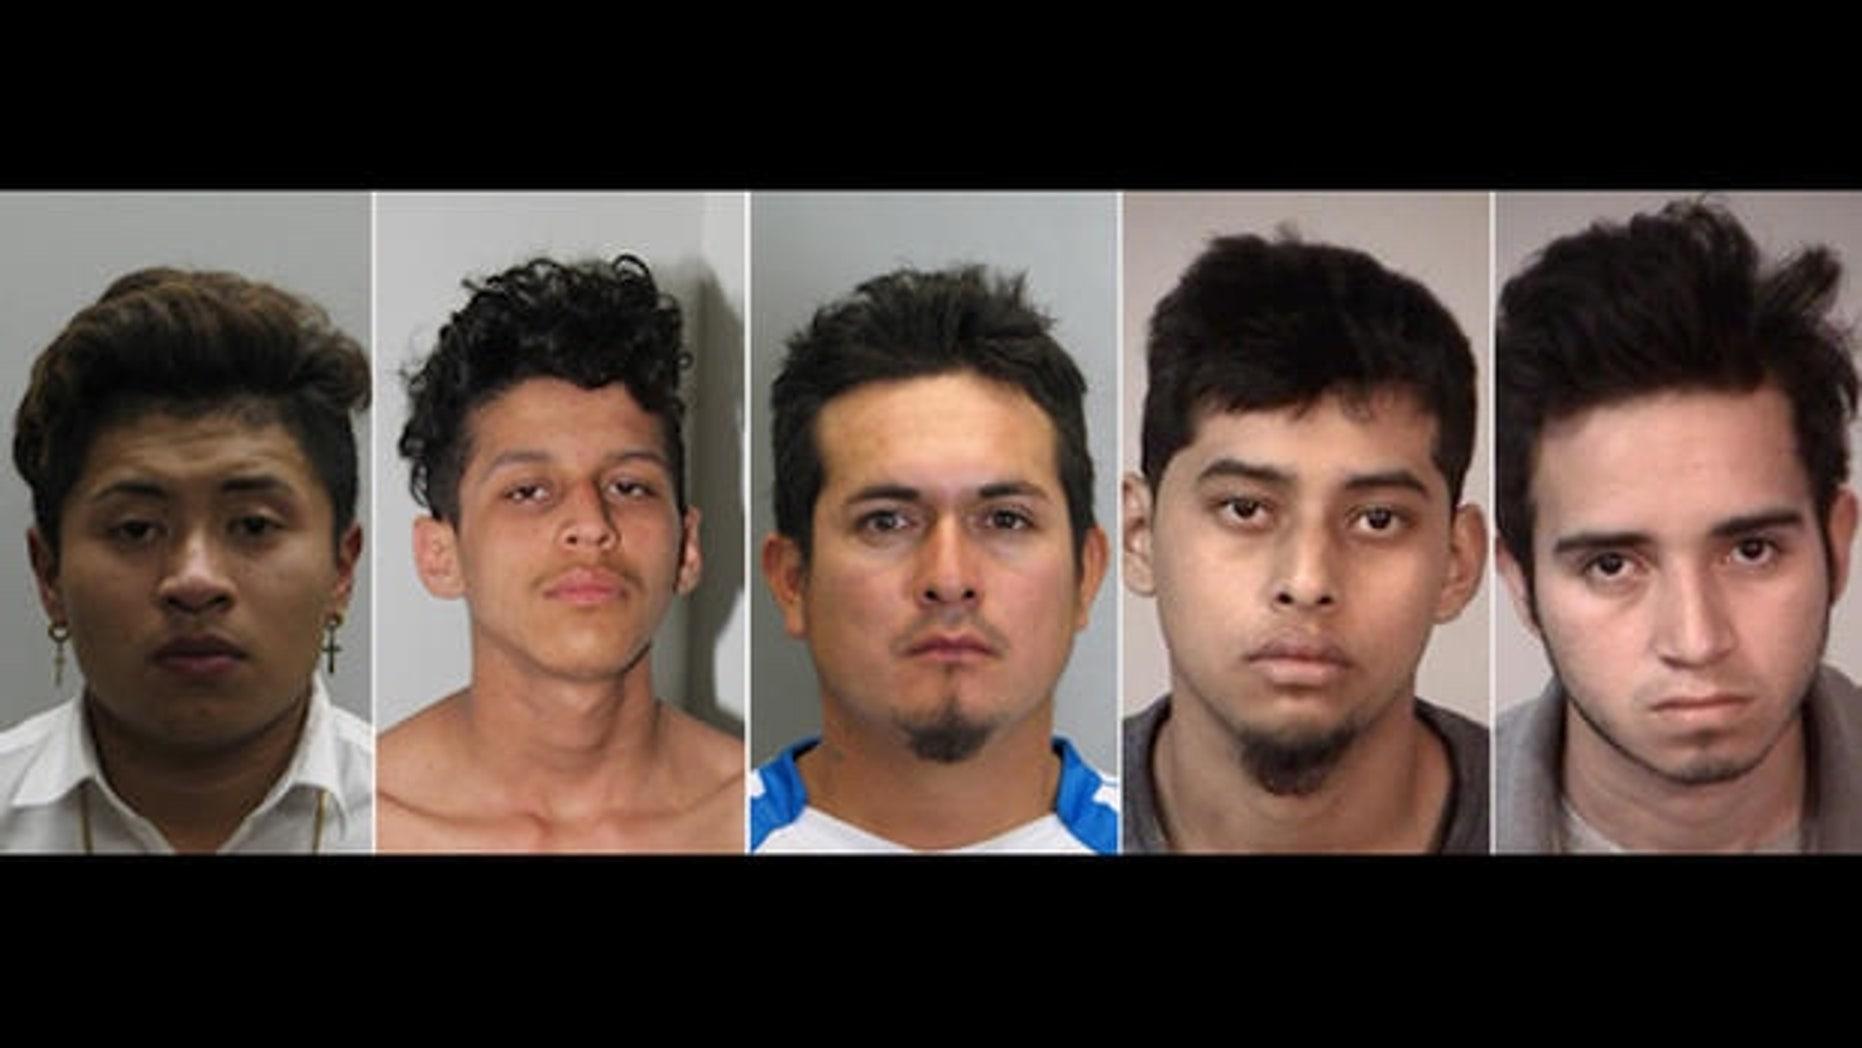 Mugshots for MS-13 gang members charged with murder this week: Jose Hernandez-Garcia, Christian Martinez-Ramirez, Jose Ordonez-Zometa, Kevin Rodriguez-Flores, Jonathan Castillo-Rivera.